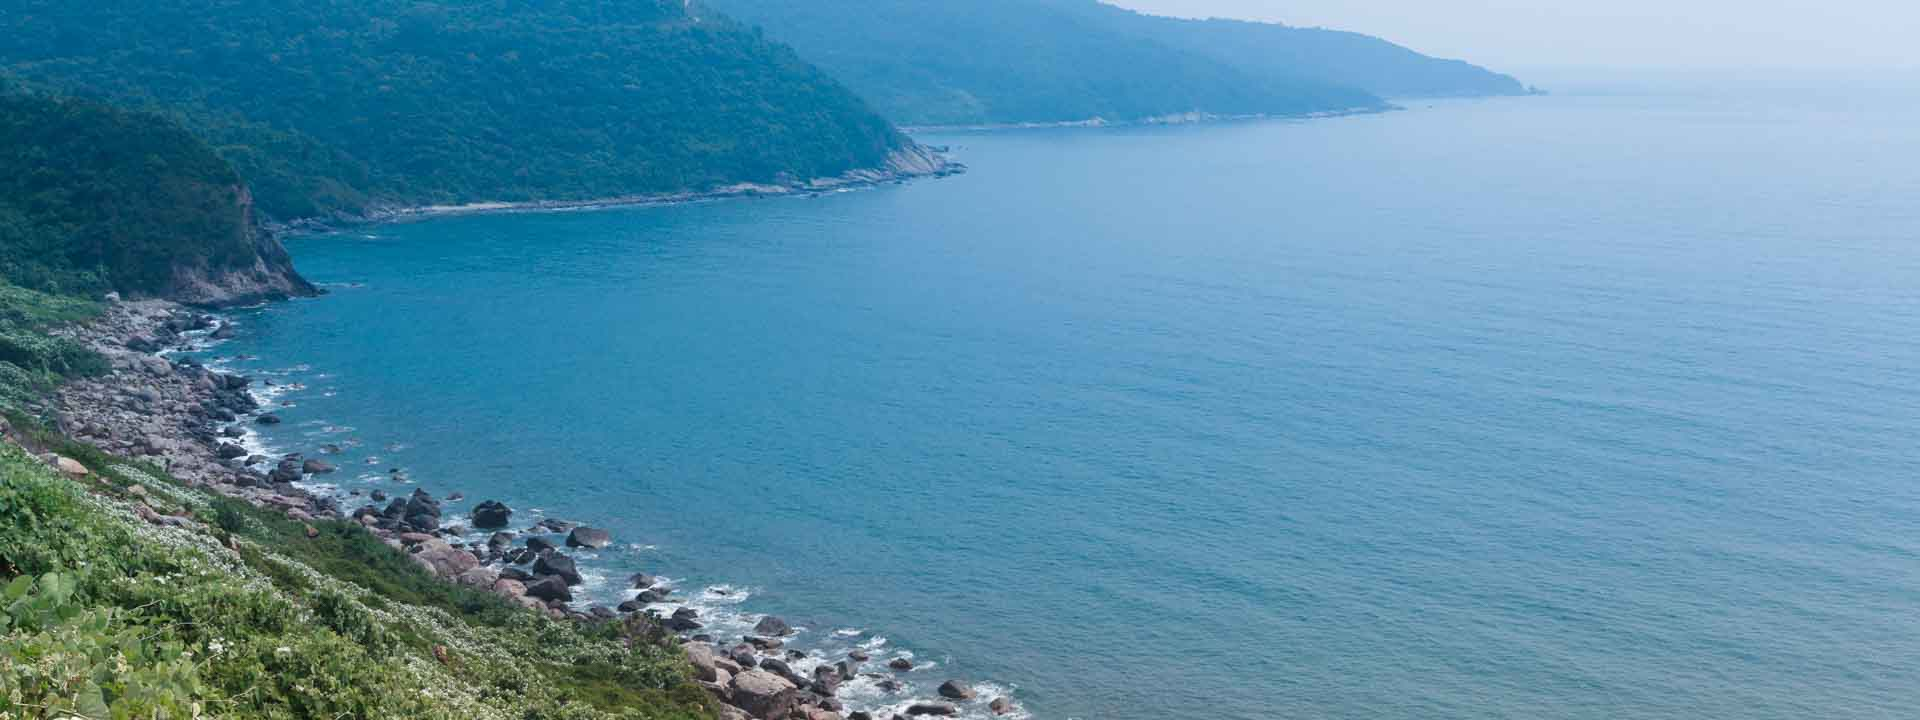 My Khe – Danang Beach Vacation 4 day